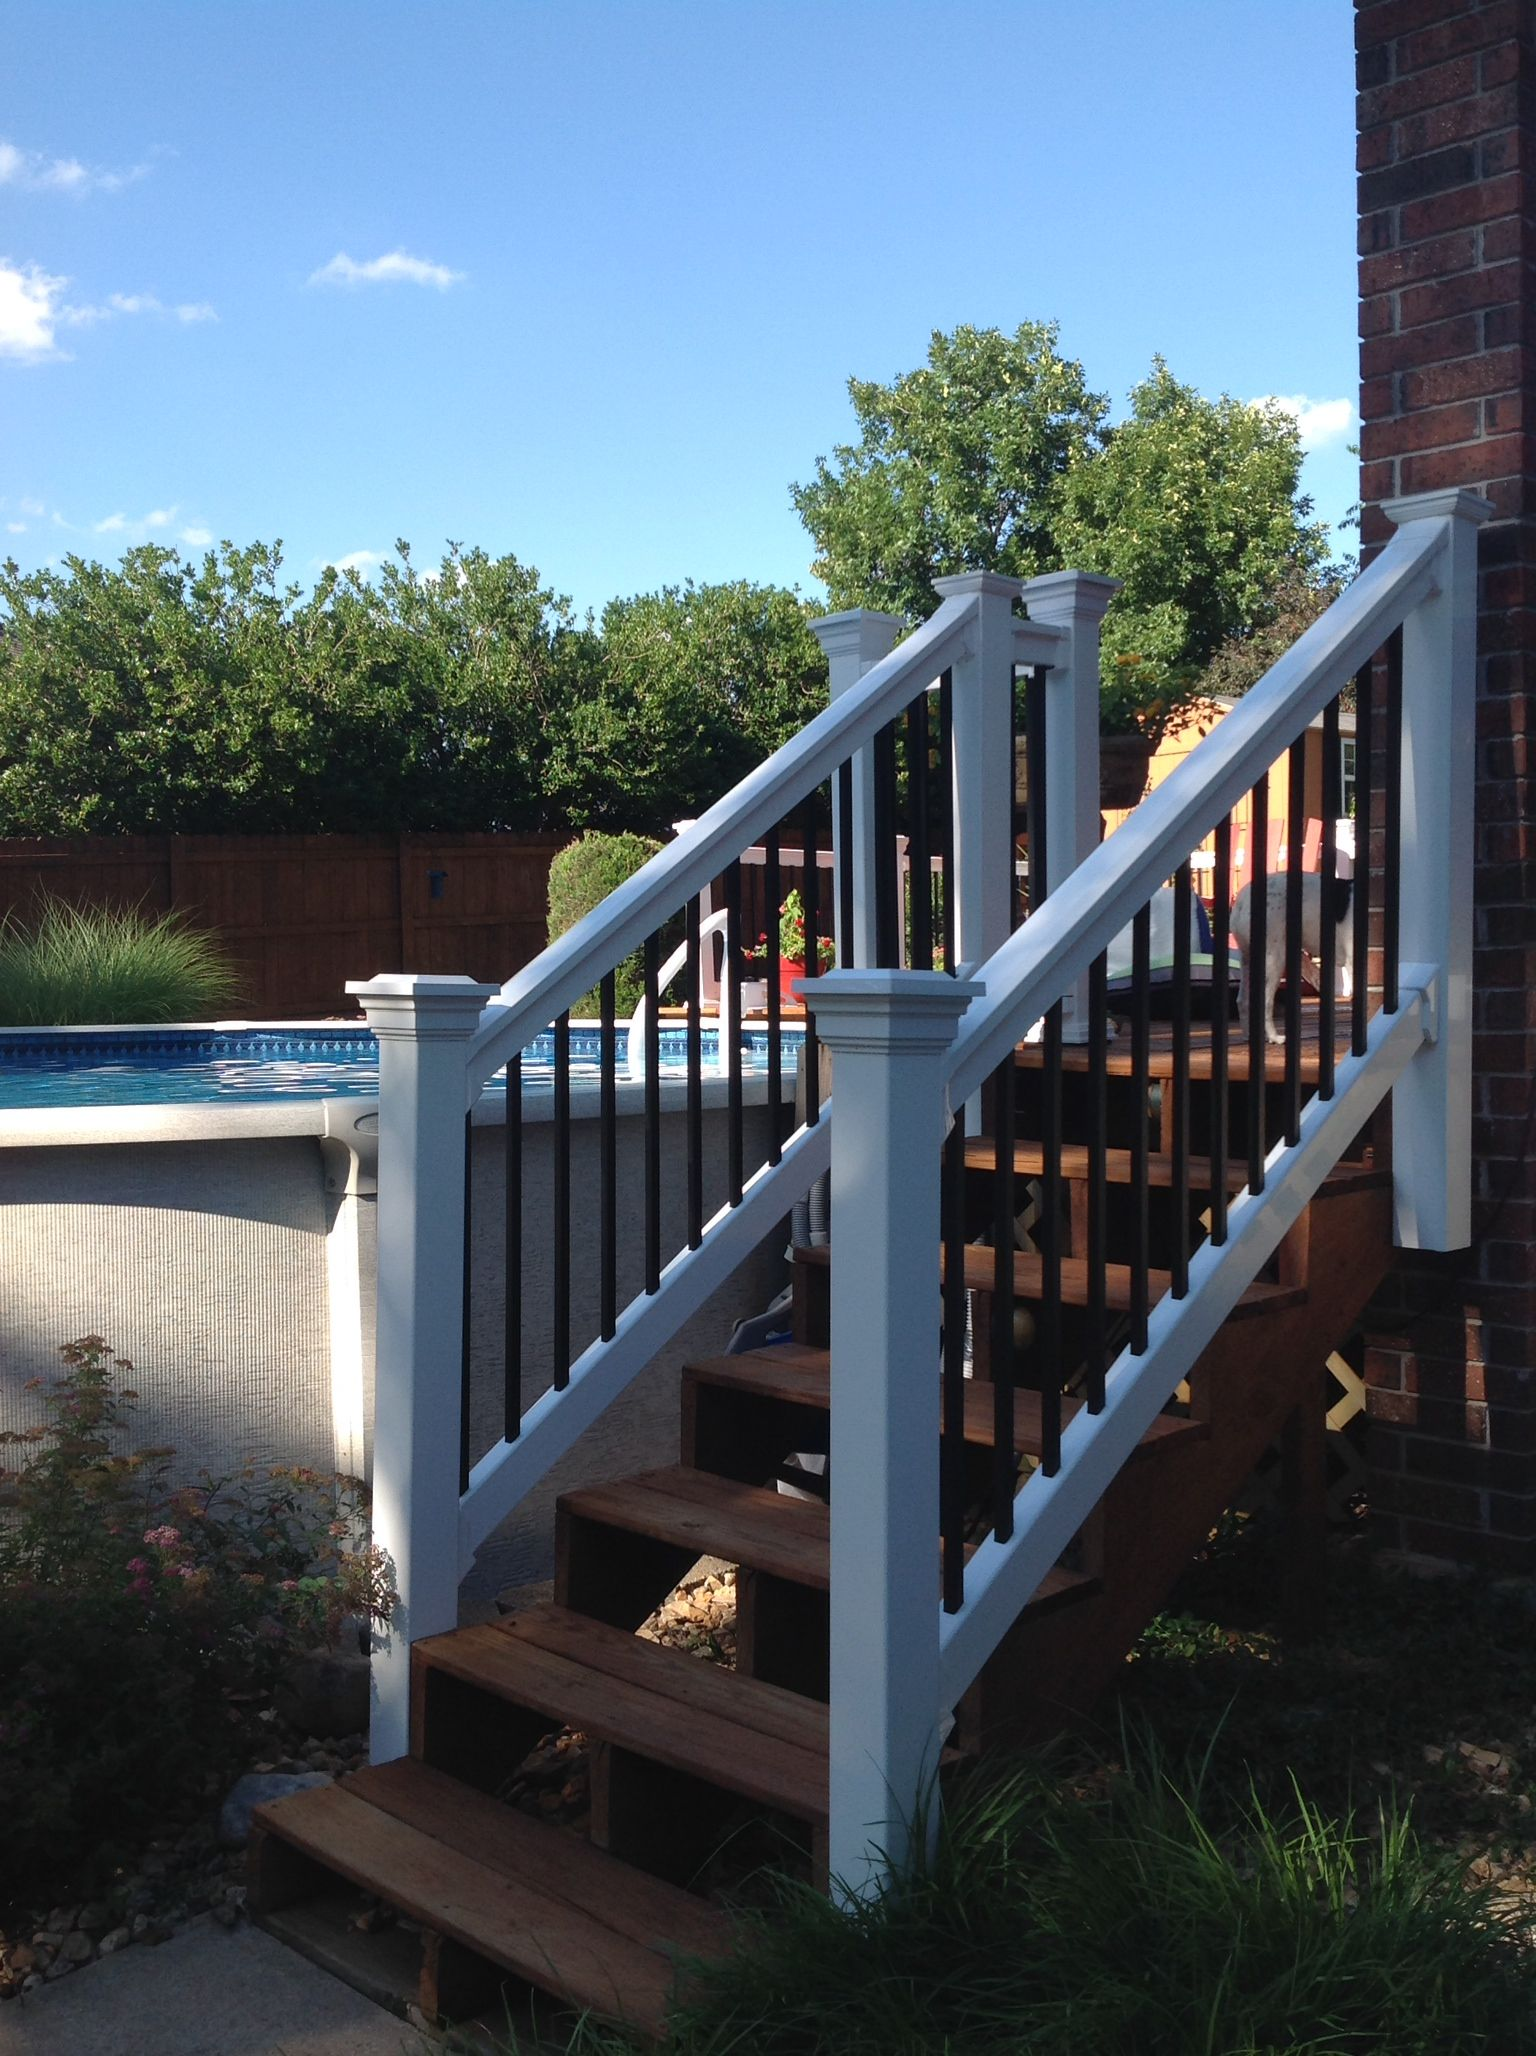 Durables Vinyl Stair Railing, Bradford White #vinylrailing #deckrailing  #durablesrailing